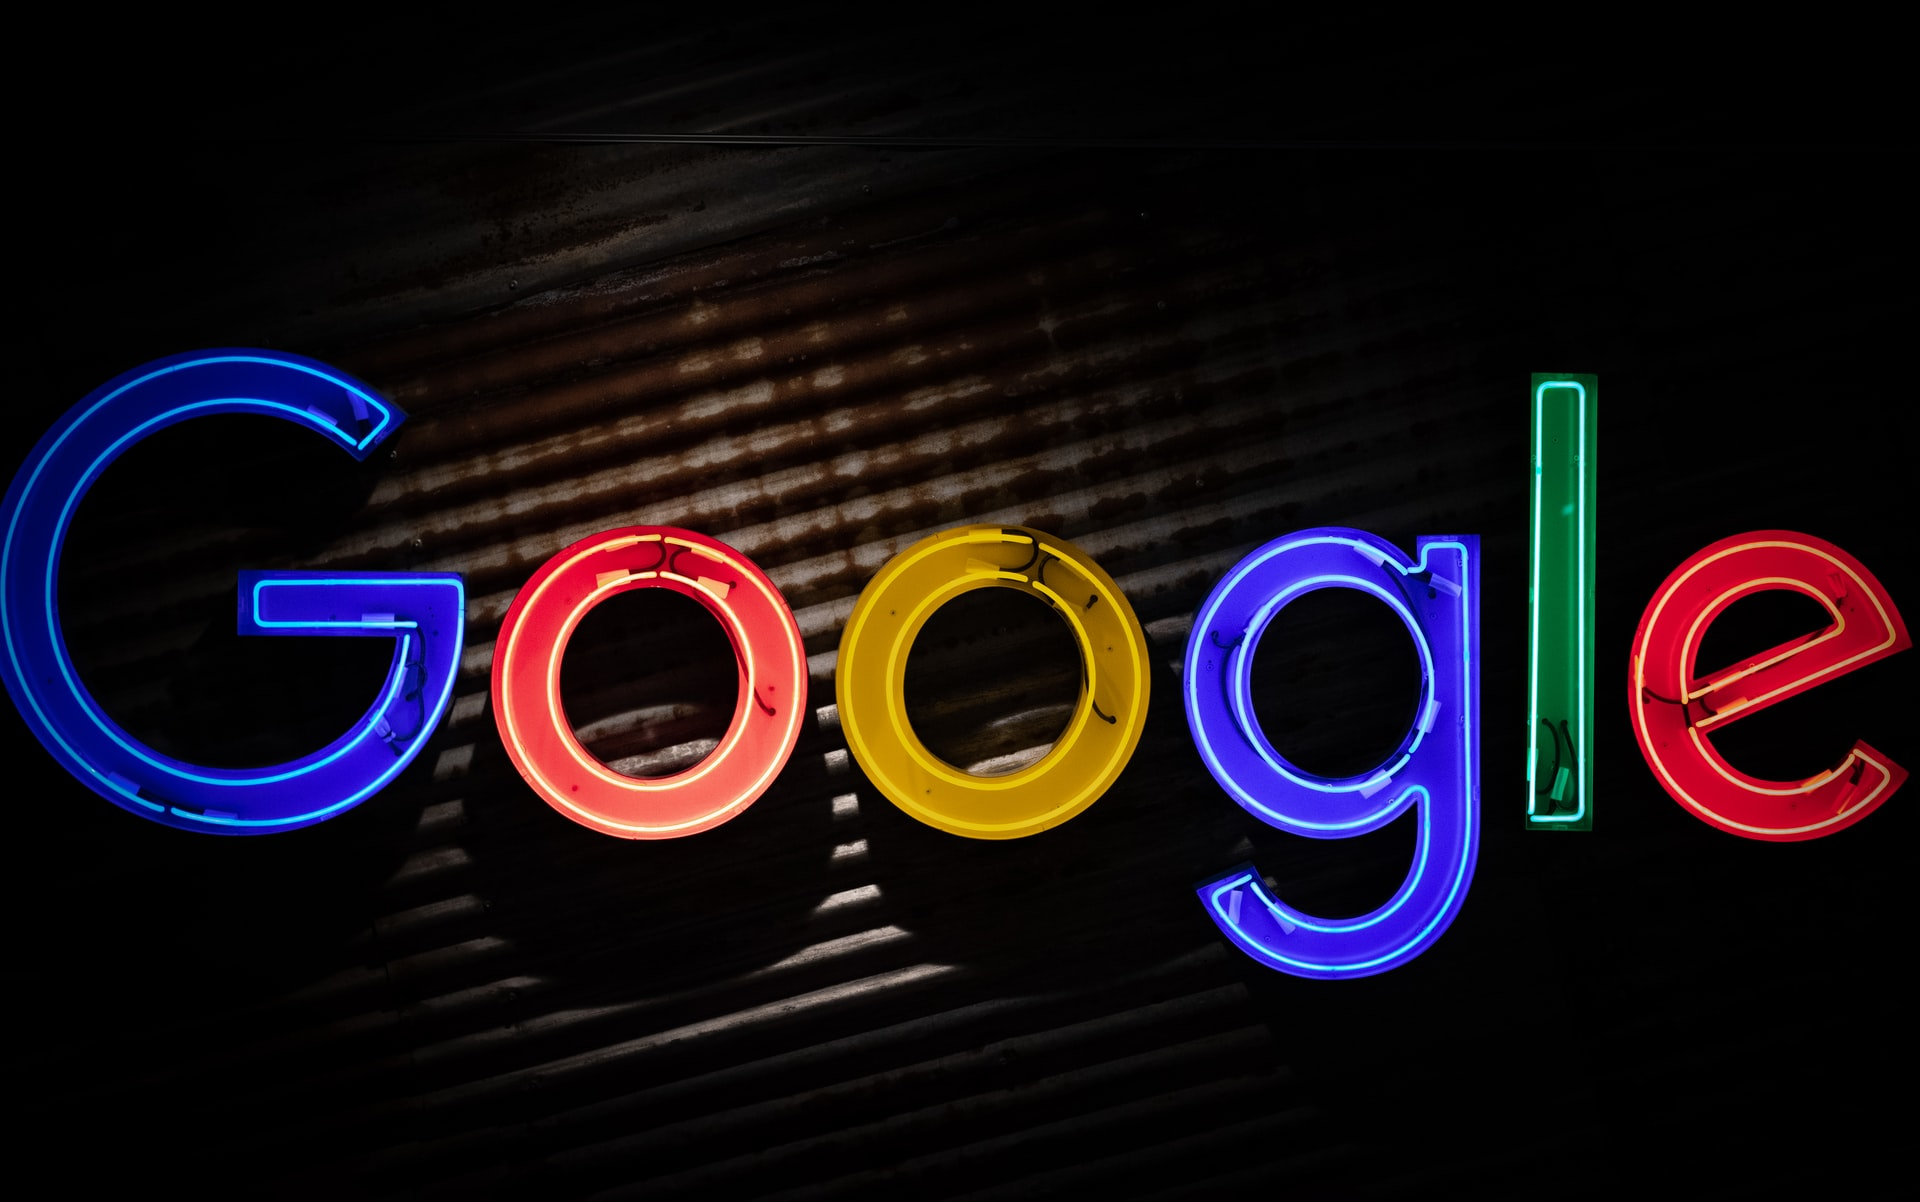 Rekabet+kurumu+affetmedi:+Google%E2%80%99a+rekor+ceza%21;